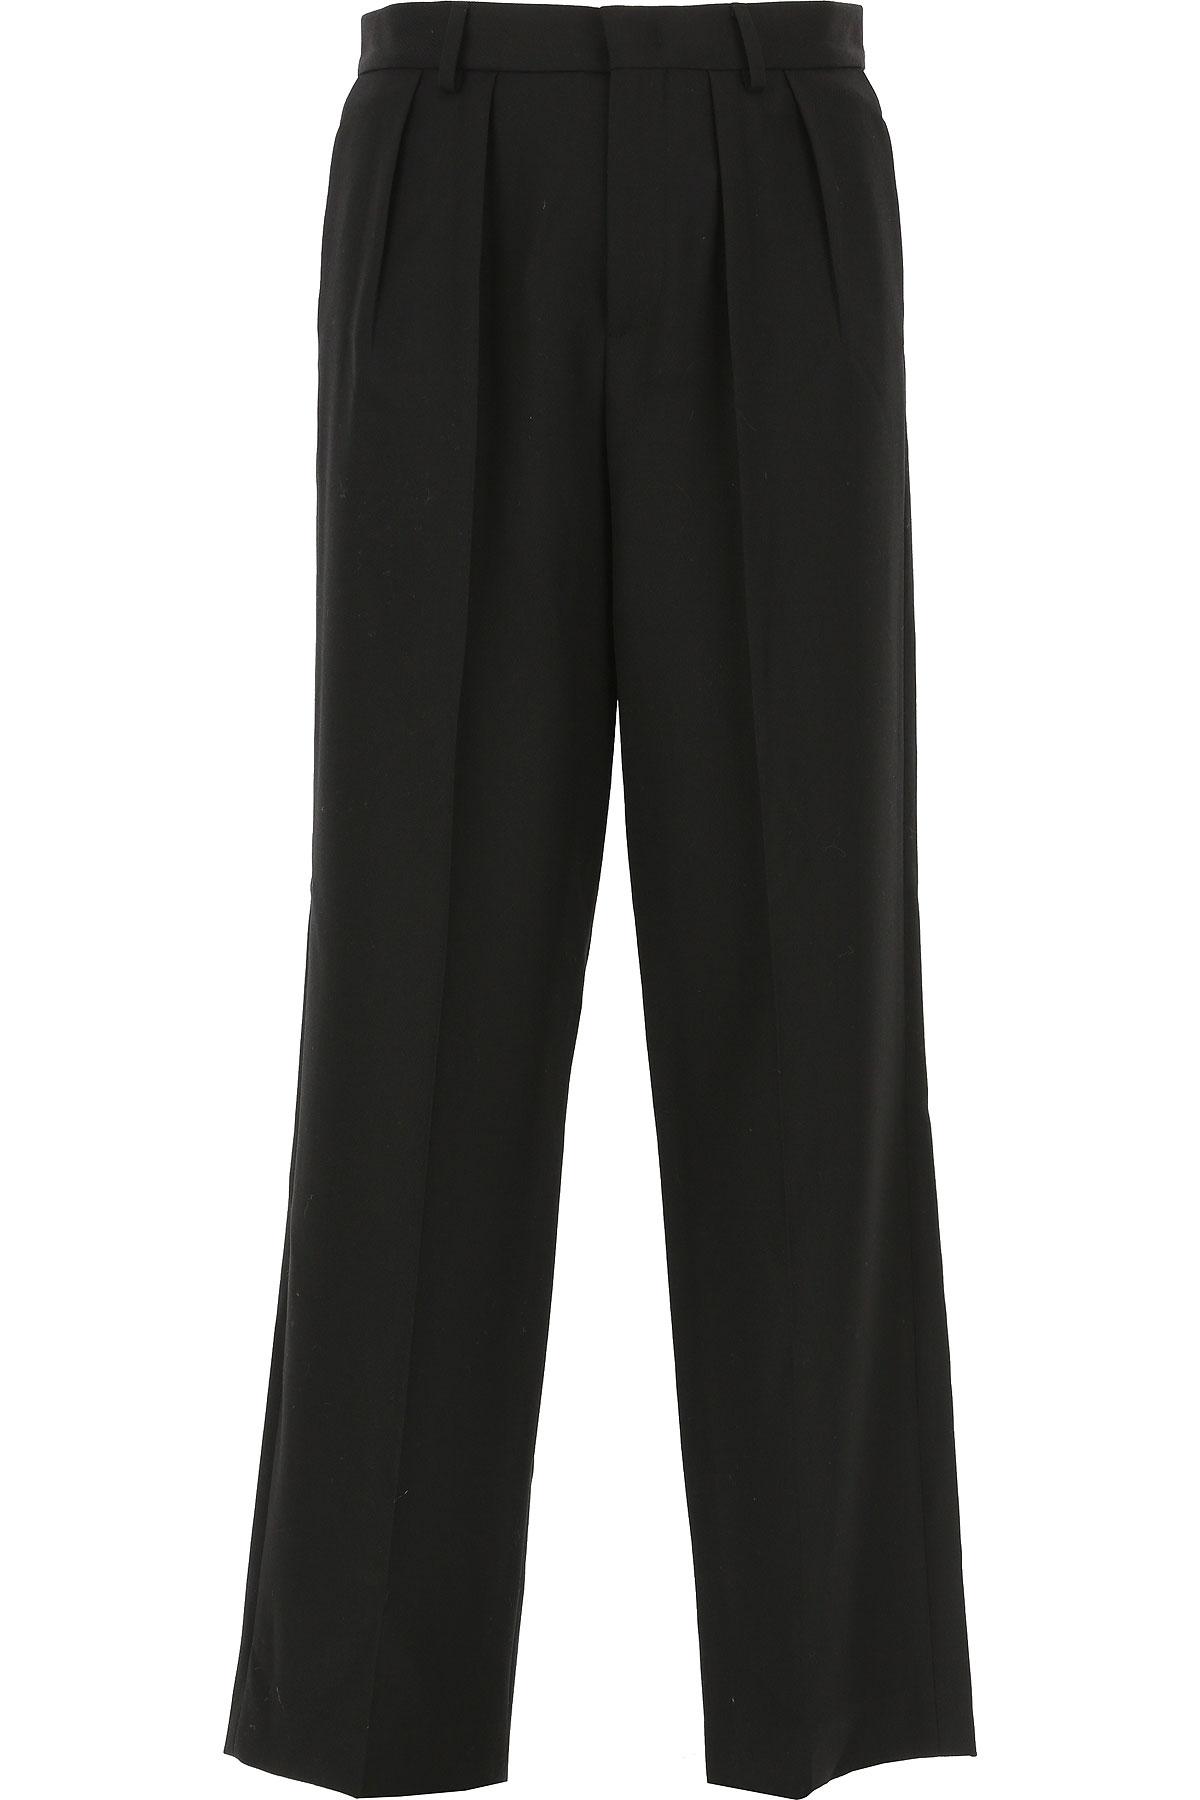 Alexander McQueen McQ Pants for Men On Sale, Black, Wool, 2019, 30 32 34 36